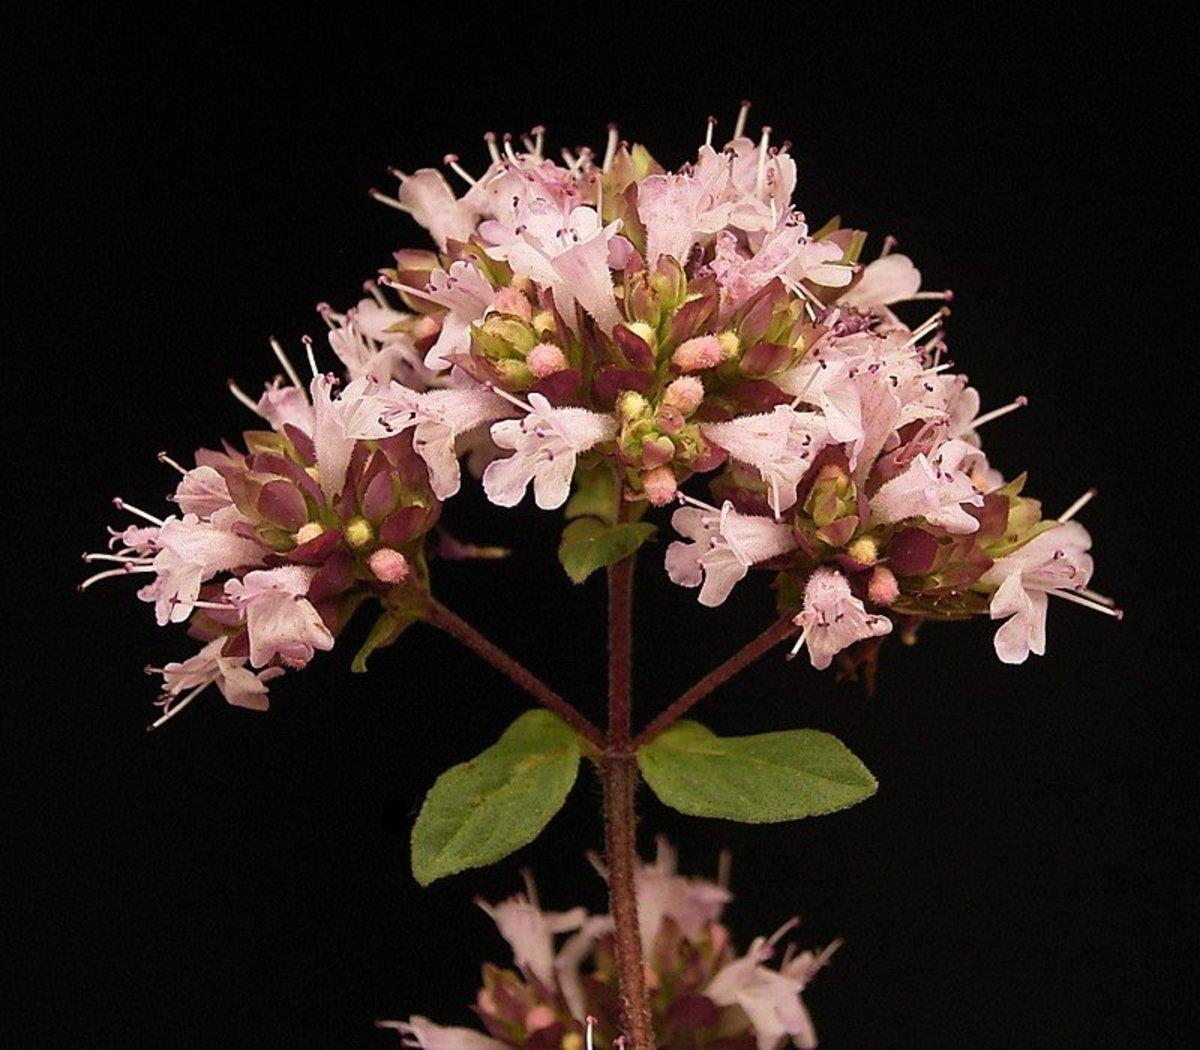 A closeup or flowering oregano.